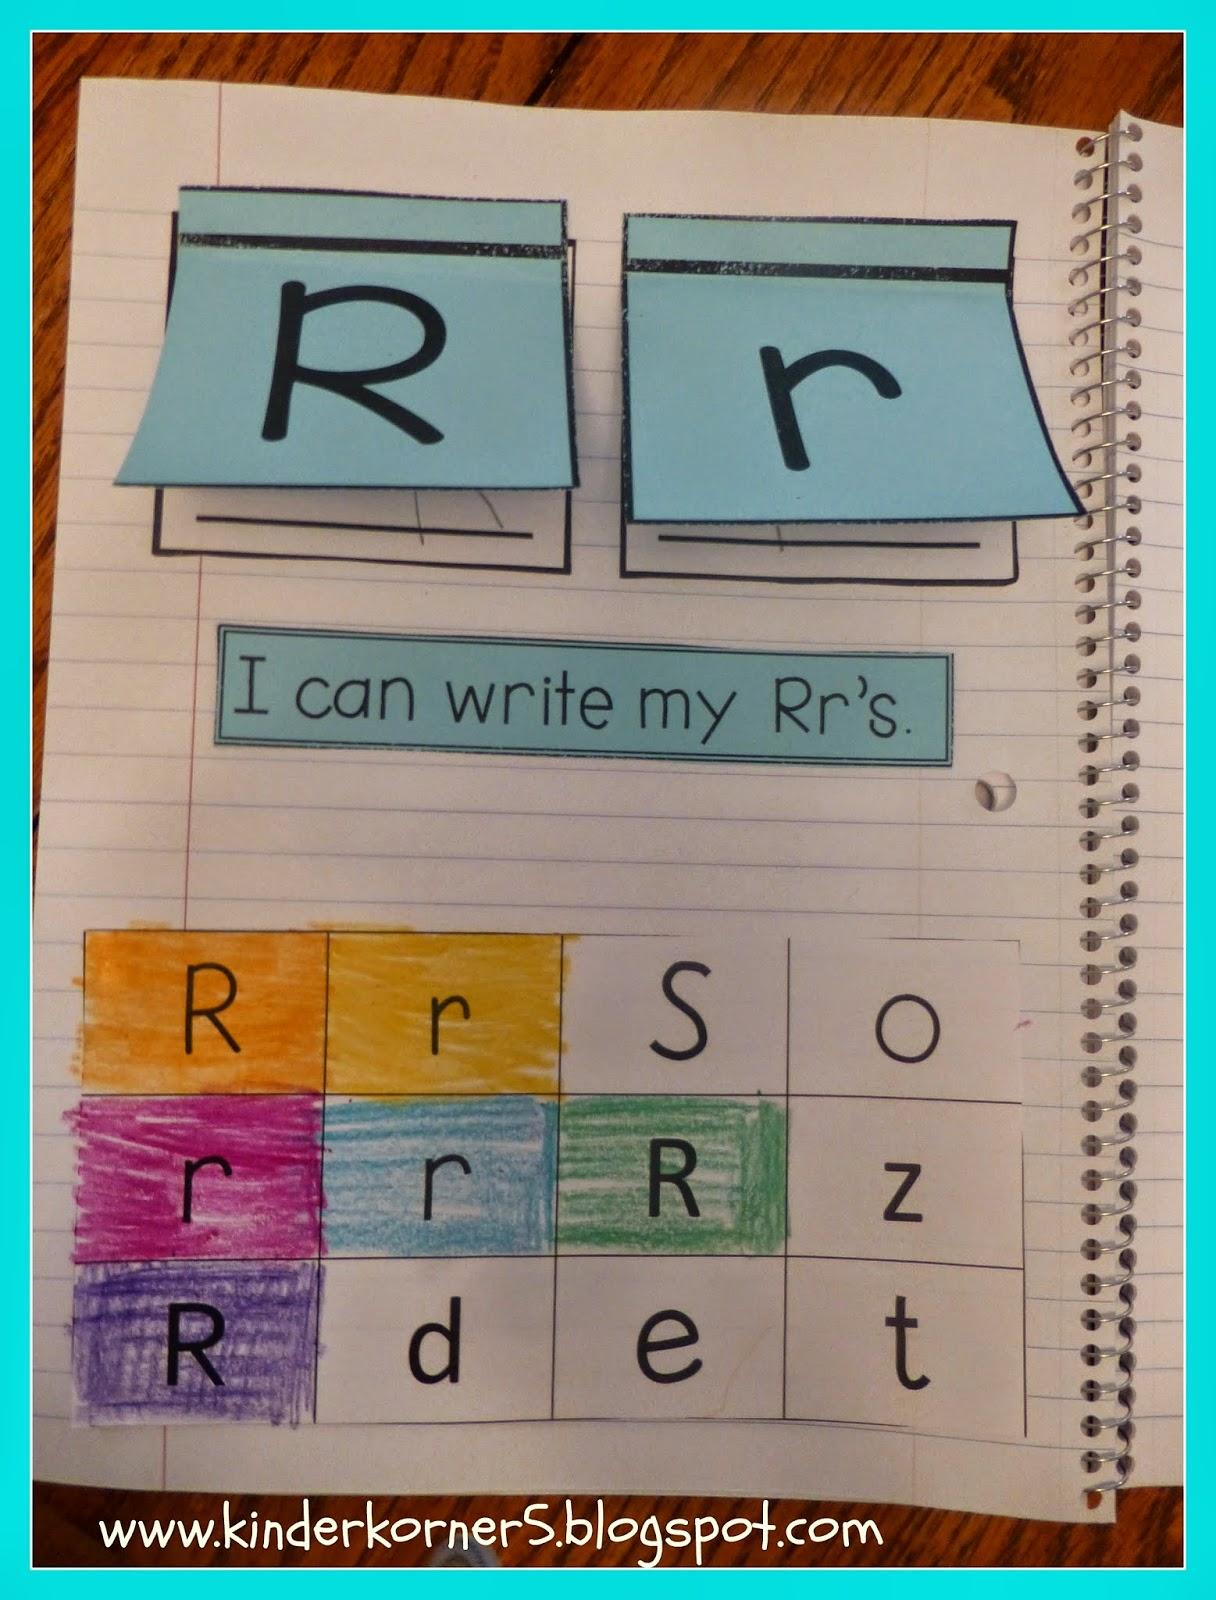 Kinder Korner Alphabet Interactive Notebook